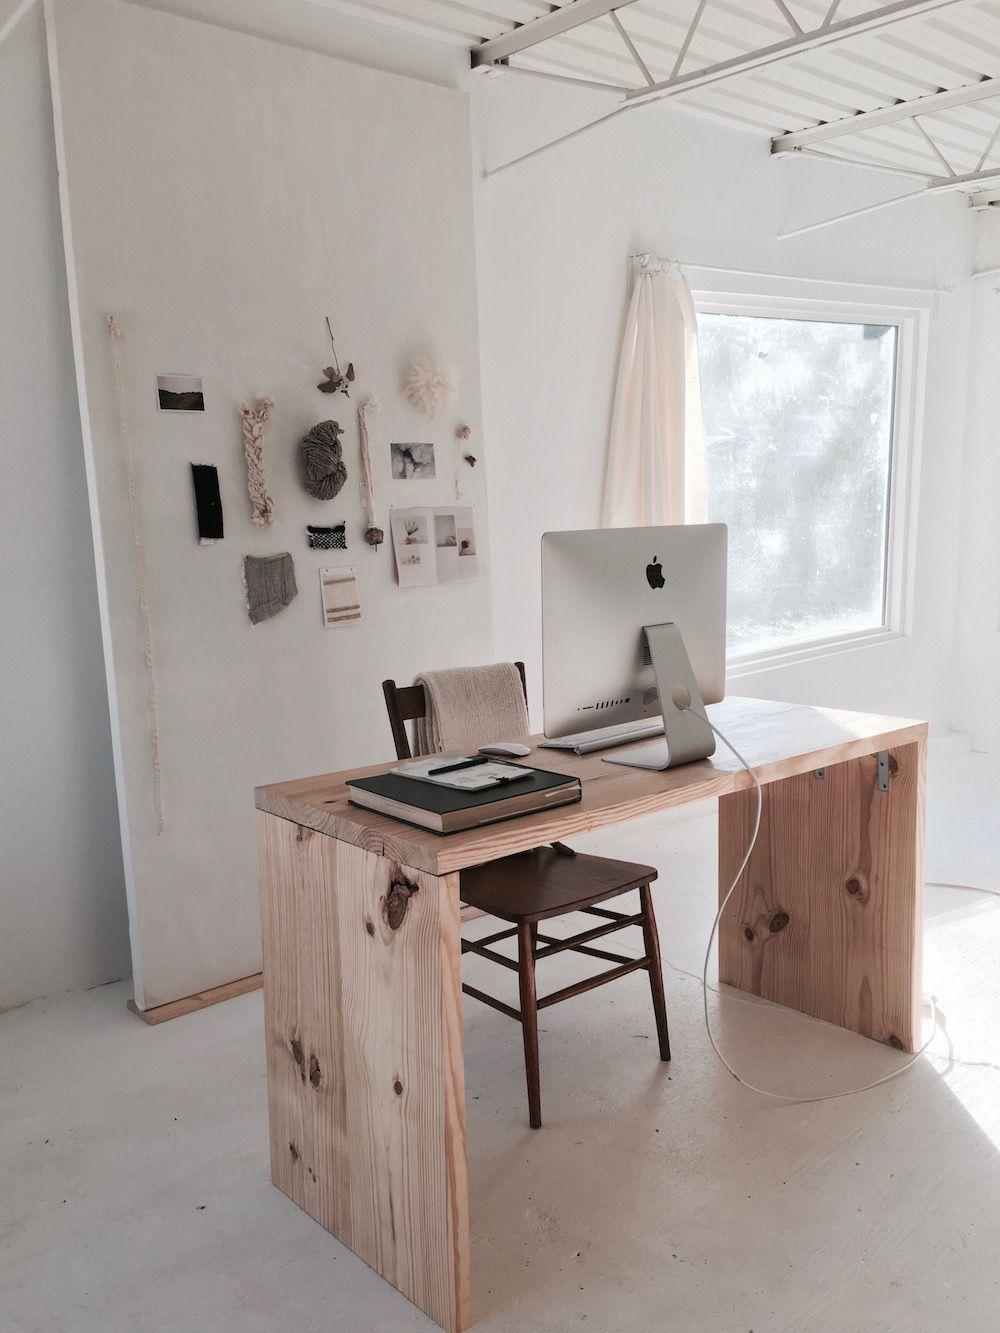 Wunderbar Inside Han Starnesu0027s Dreamily Minimalist Nashville Studio | Of A Kind